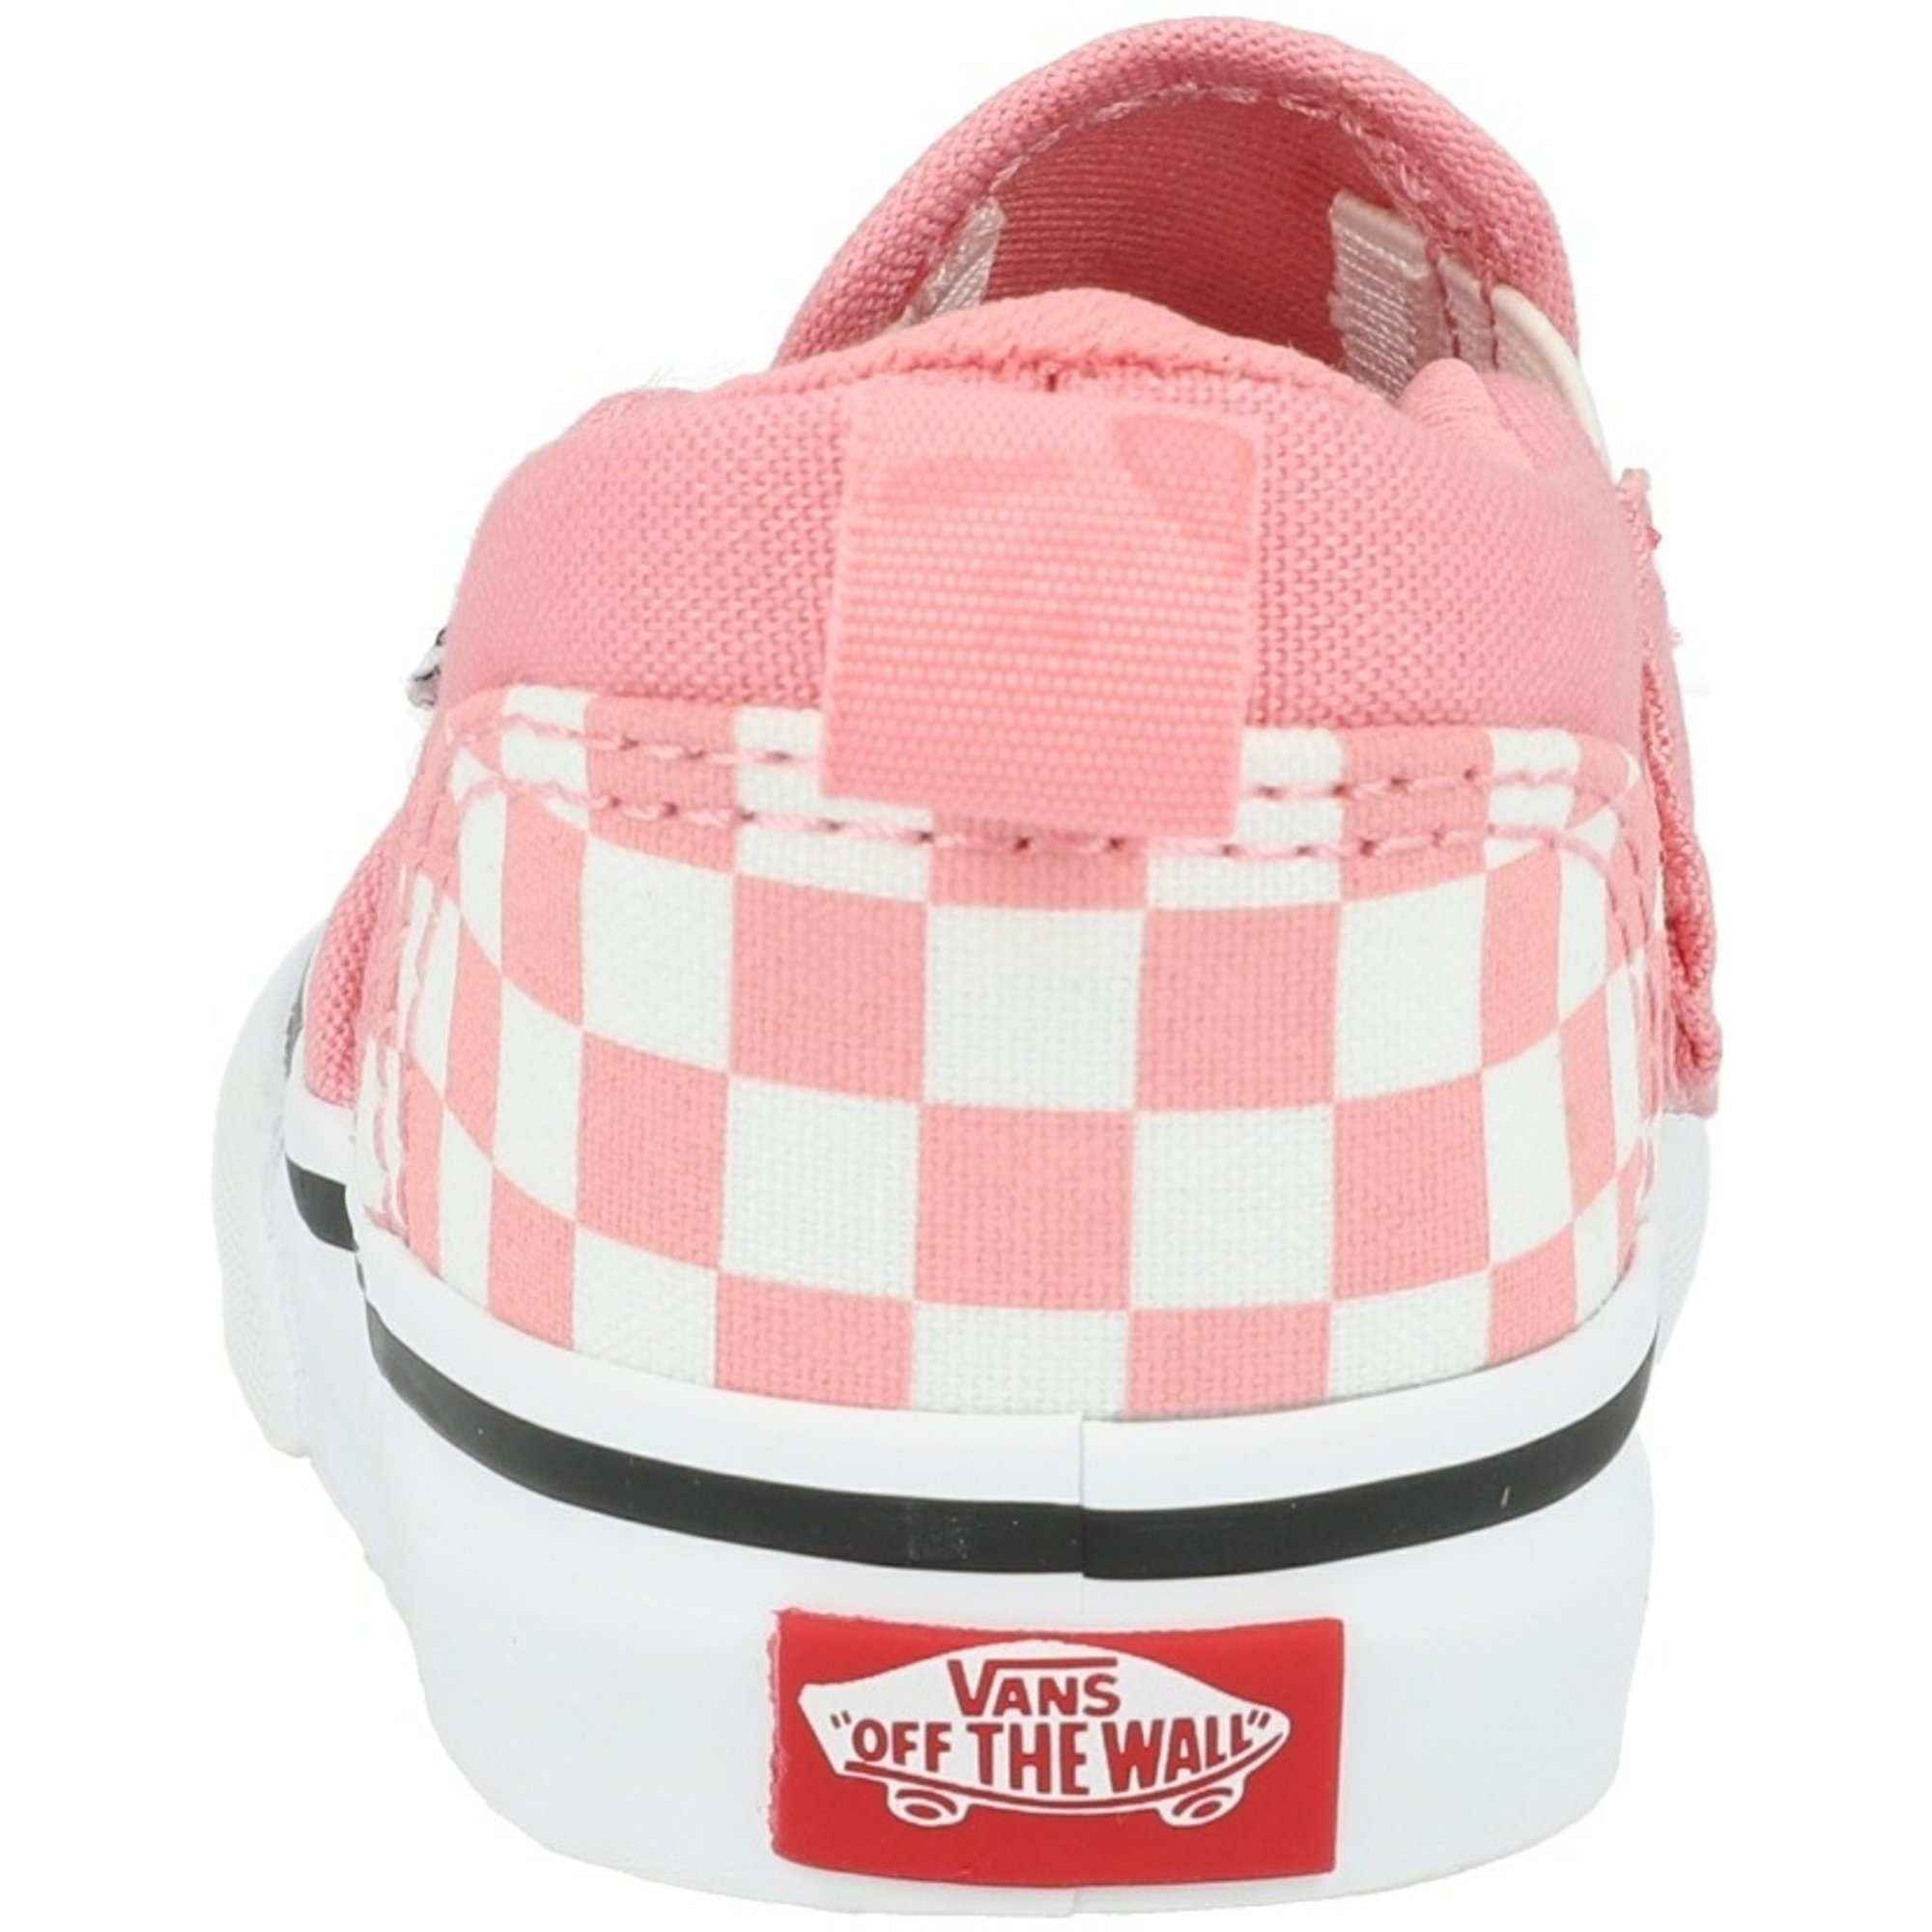 Vans Active TD Asher V Pink Icing Checkerboard Canvas Infant